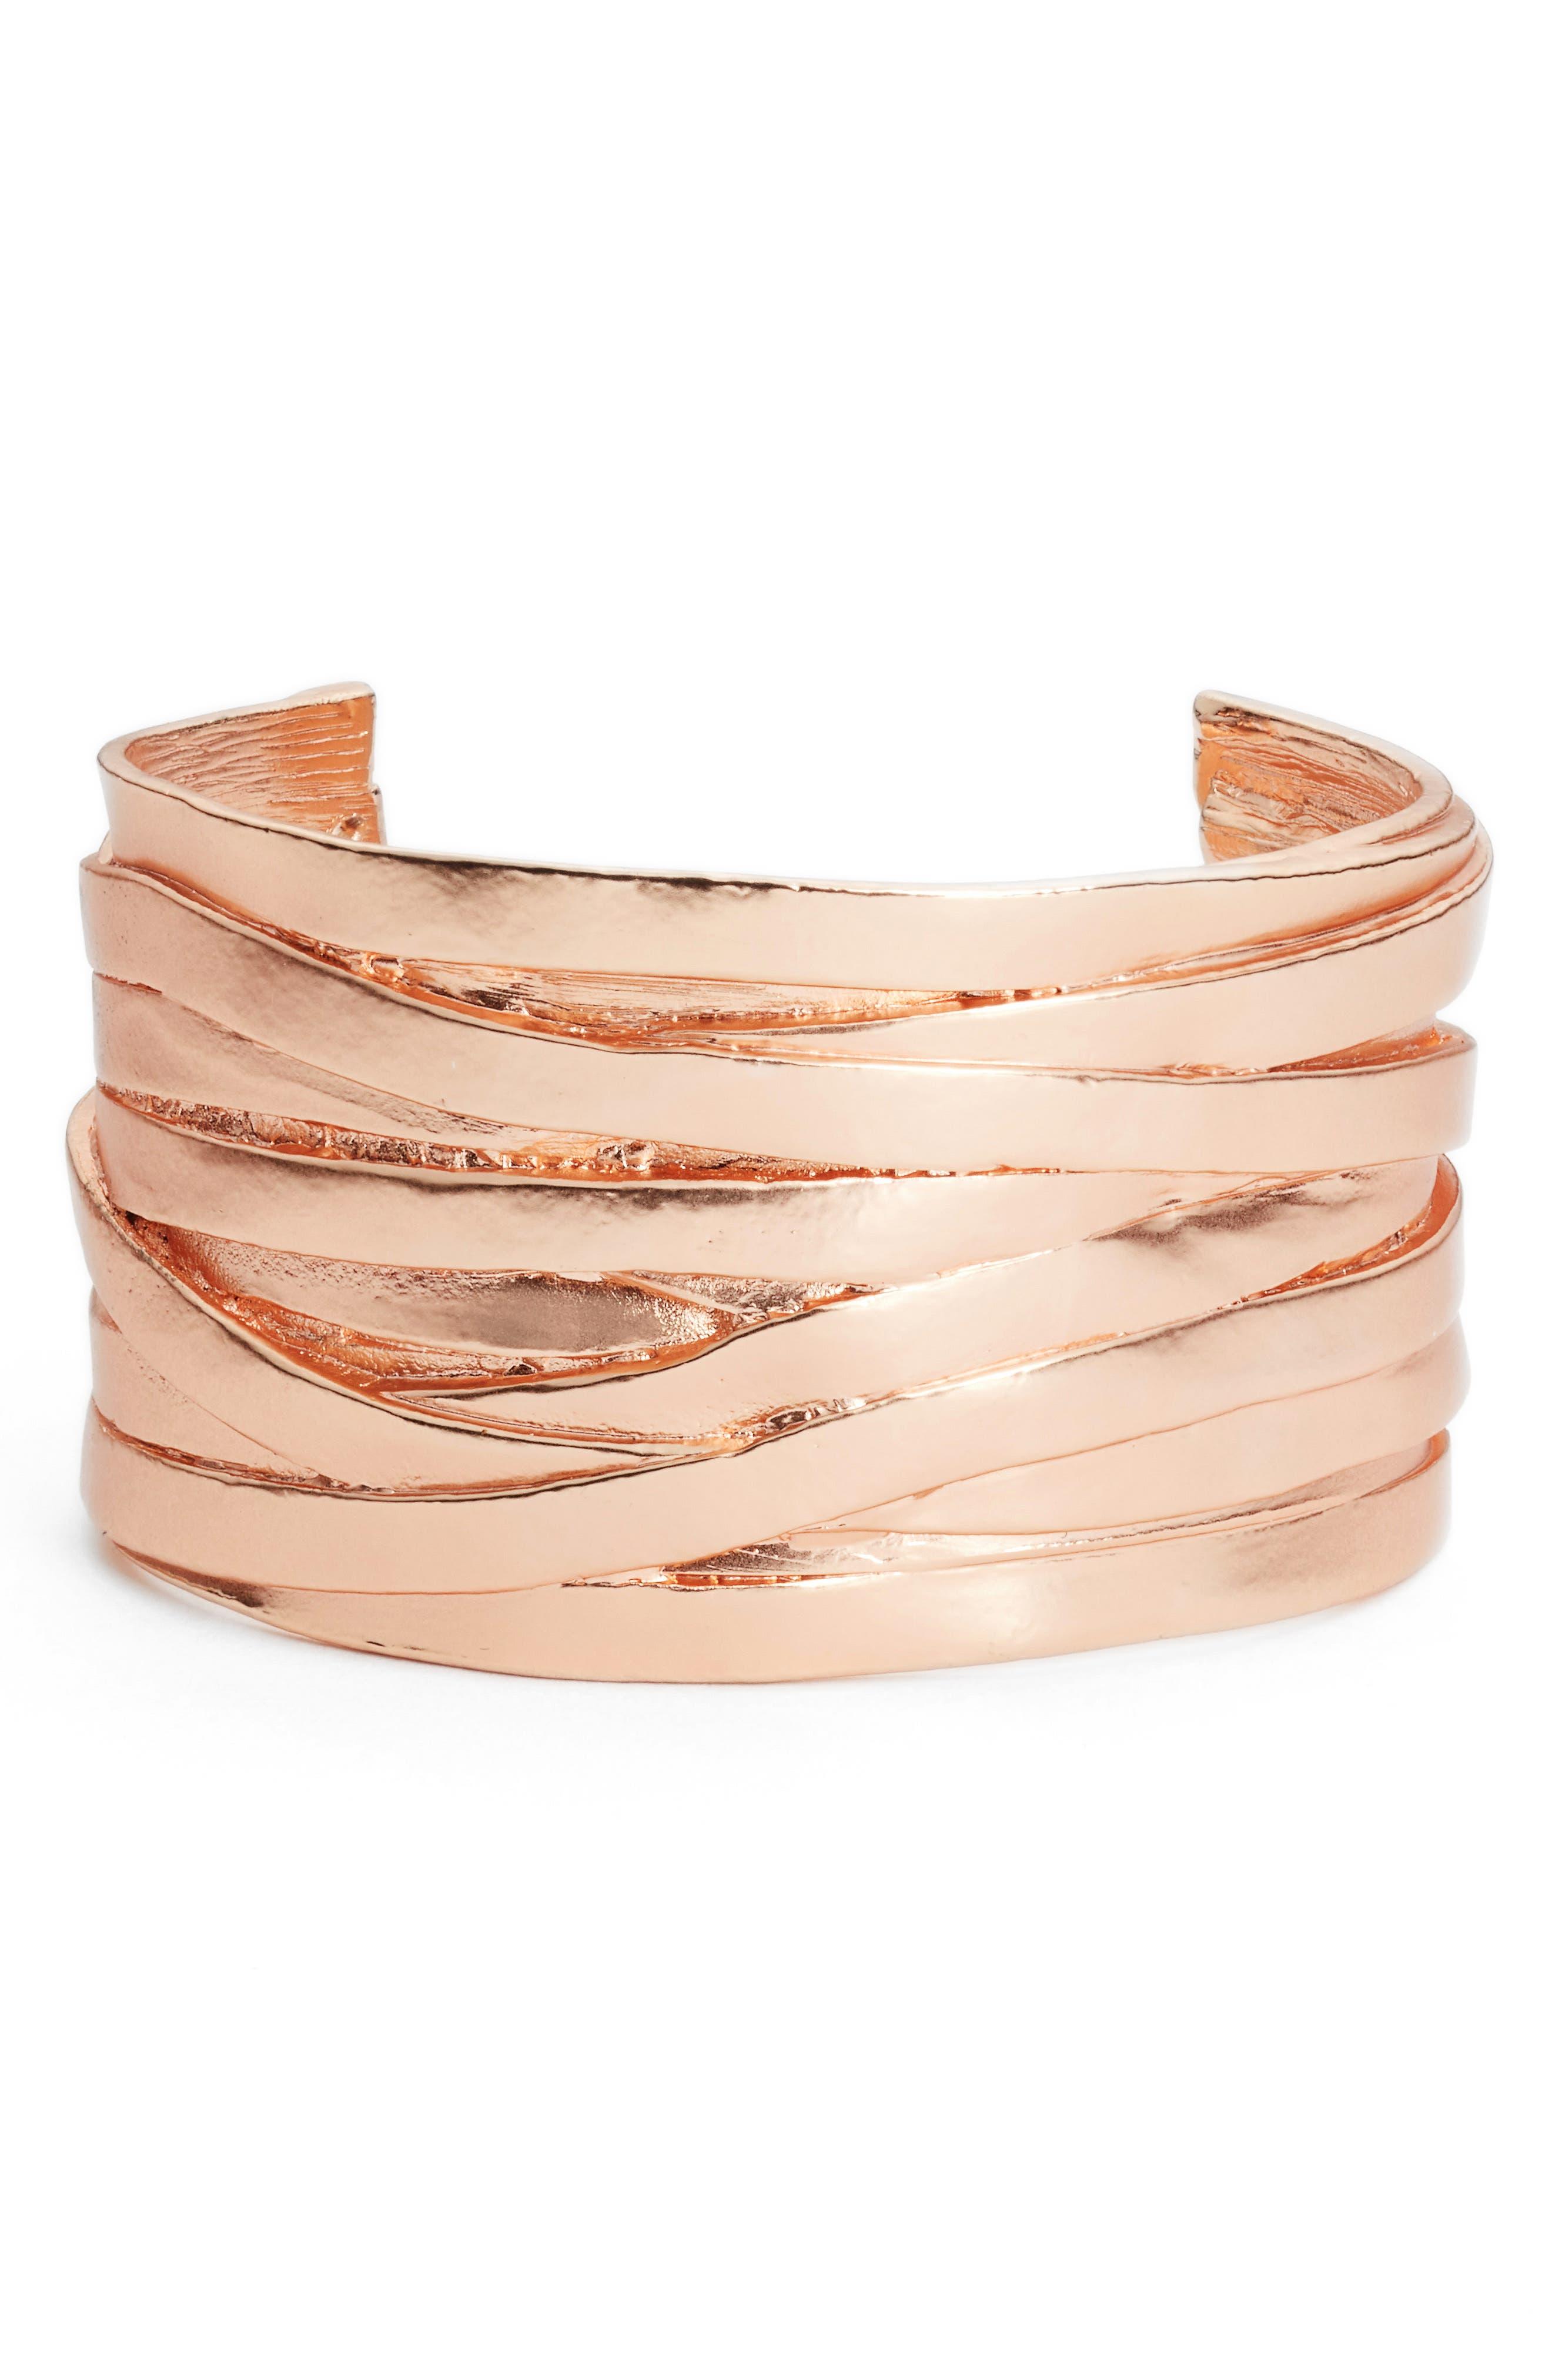 Angelique Wrist Cuff,                         Main,                         color, Rose Gold